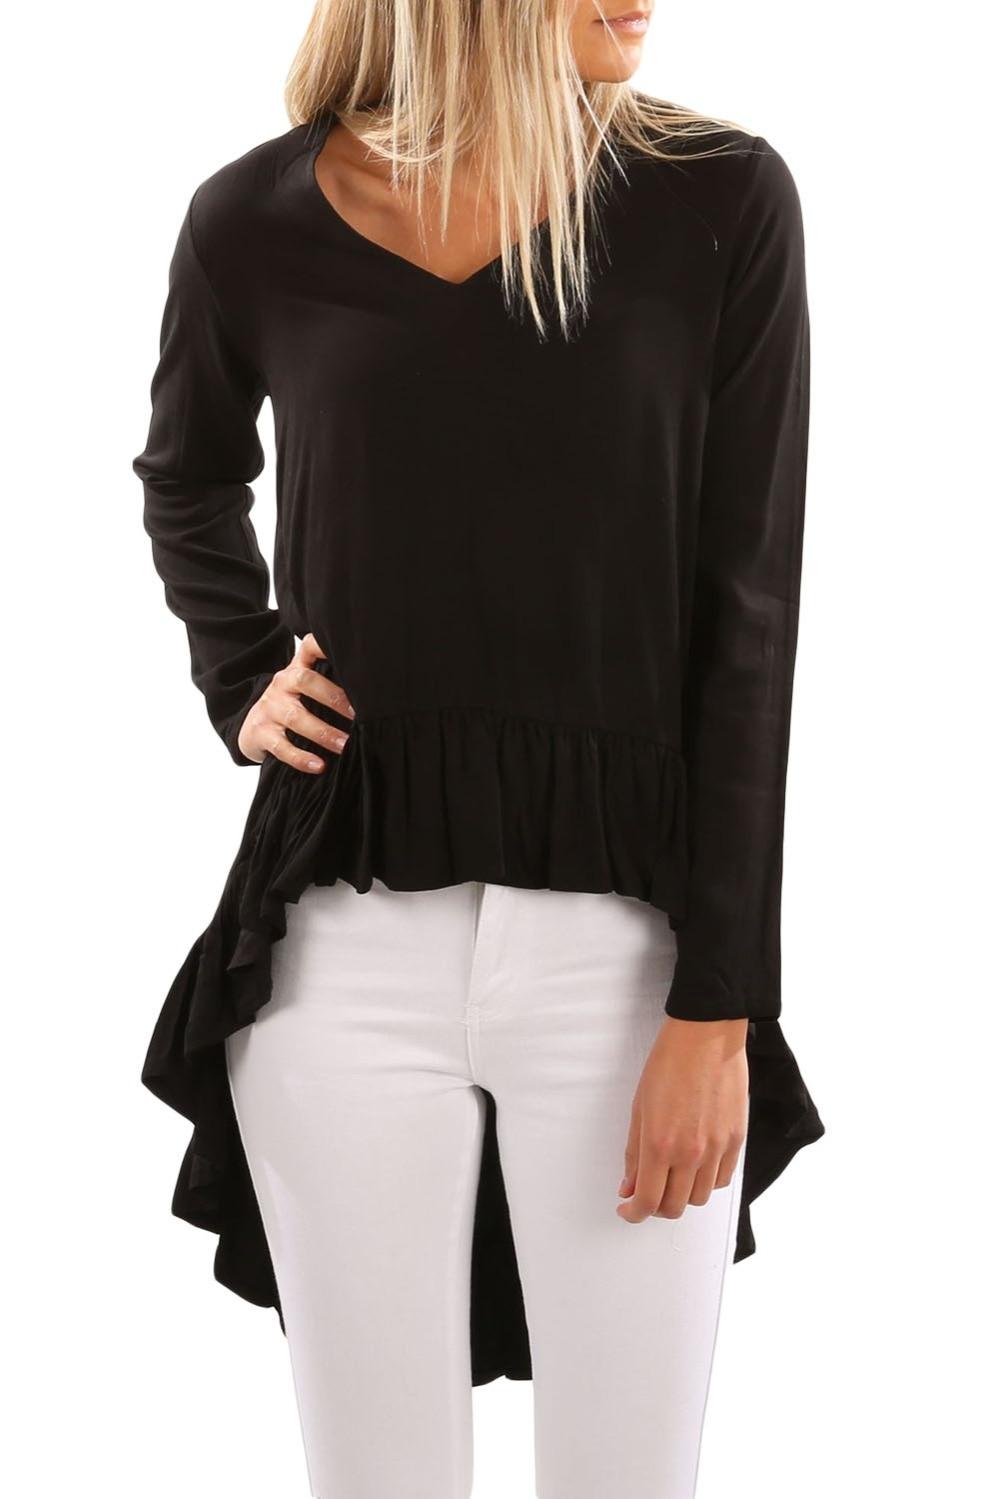 Women V Neck Longer Frilled Hem Back Top Autumn Full Sleeve Irregular Long T shirt 3 Colors Plus Size Streetwear Shirts Tops